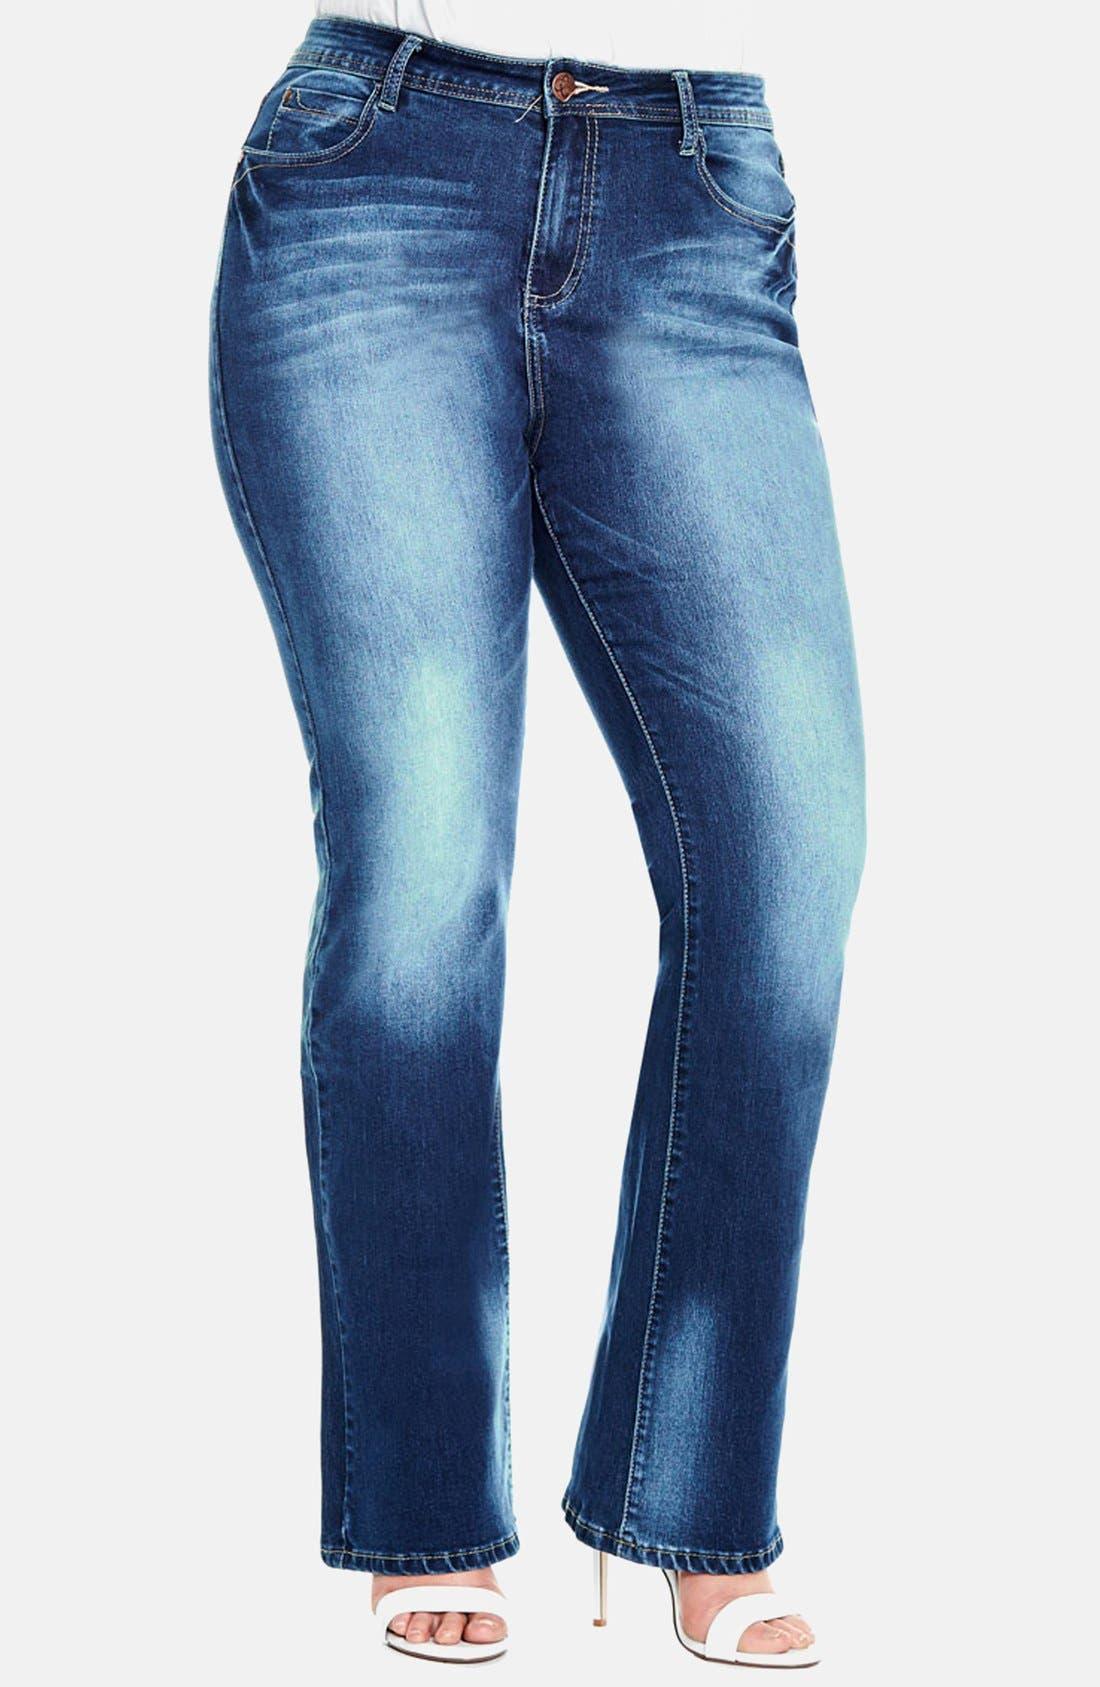 Main Image - City Chic 'Clean Cut' Stretch Bootcut Jeans (Mid Denim) (Plus Size)